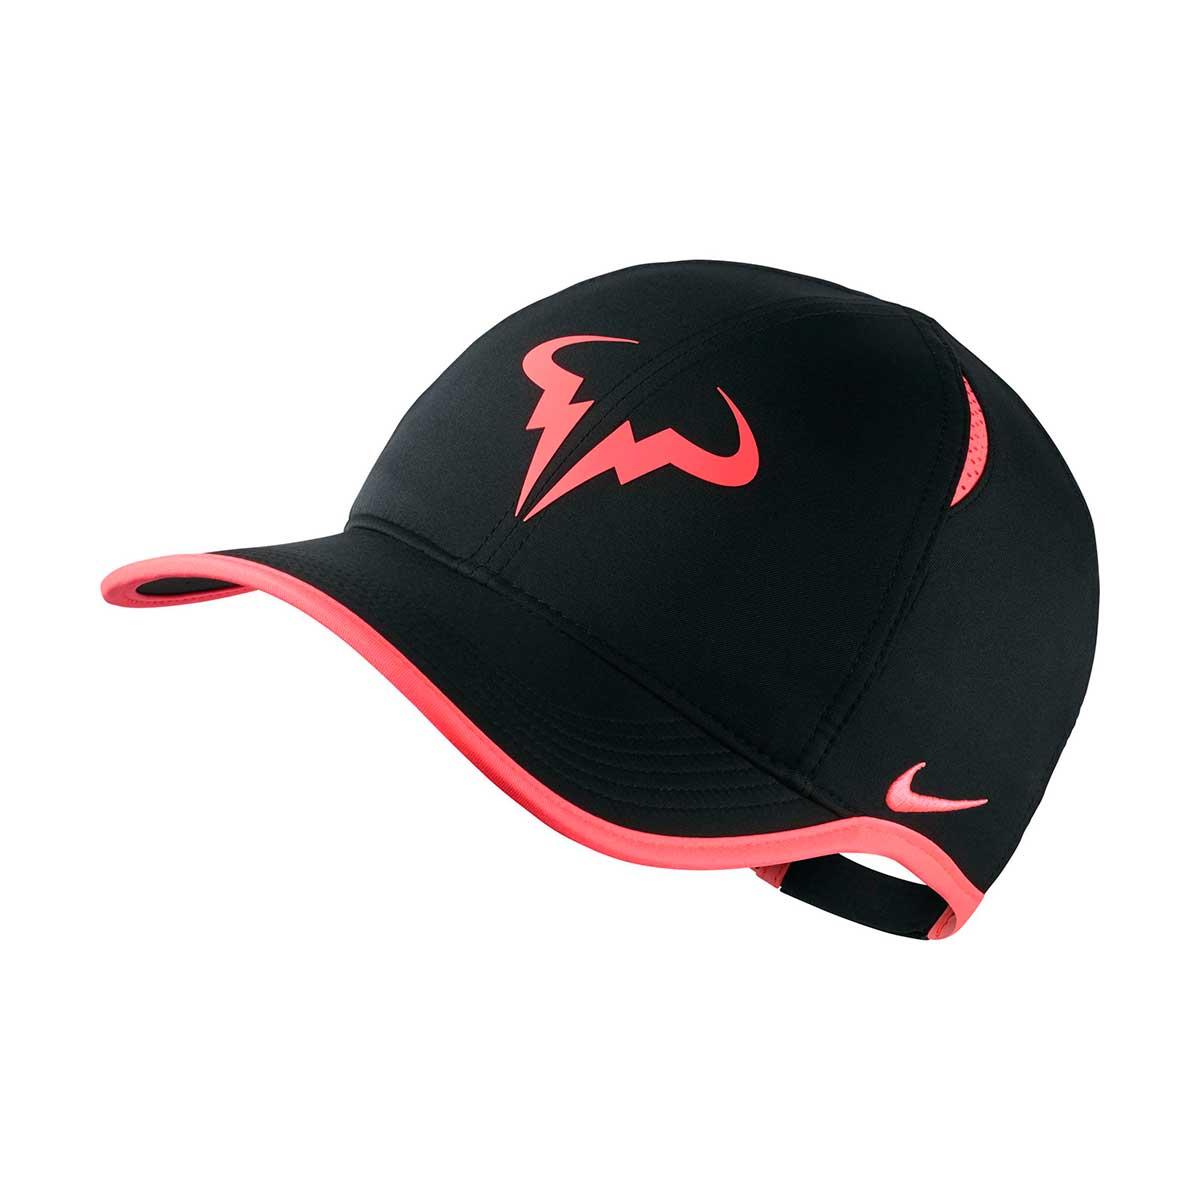 7171cba28 Nike Rafa Feather Light Bull Cap (Black/White)